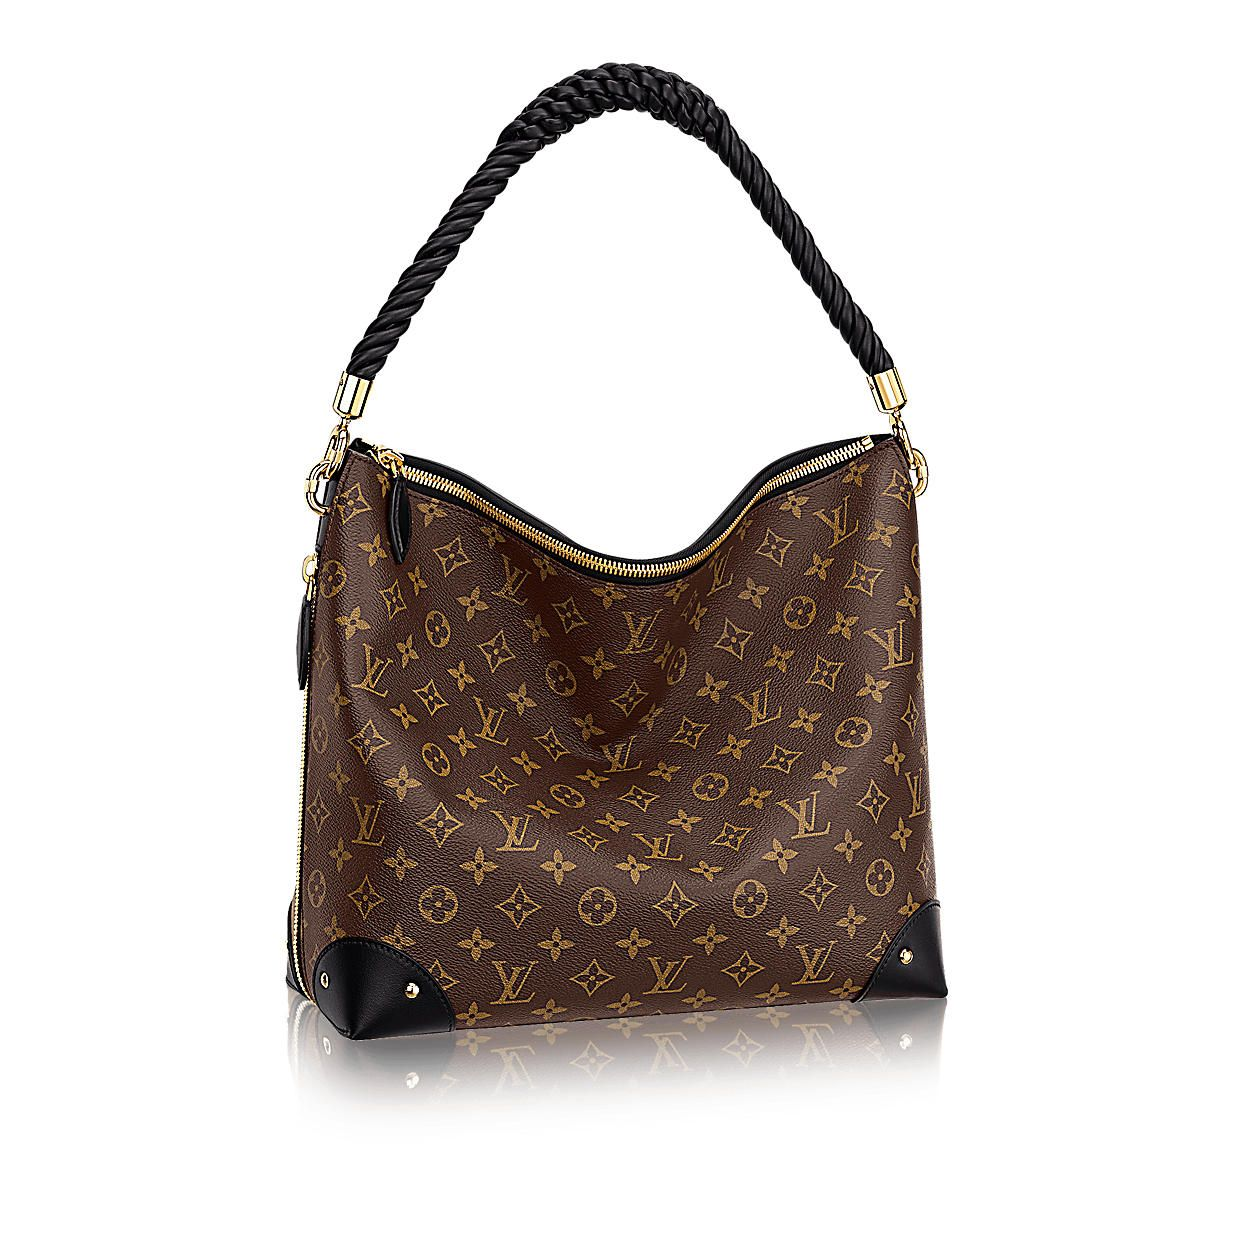 68076a2c6601 Designer Handbags for Women in Leather   Canvas - LOUIS VUITTON ...